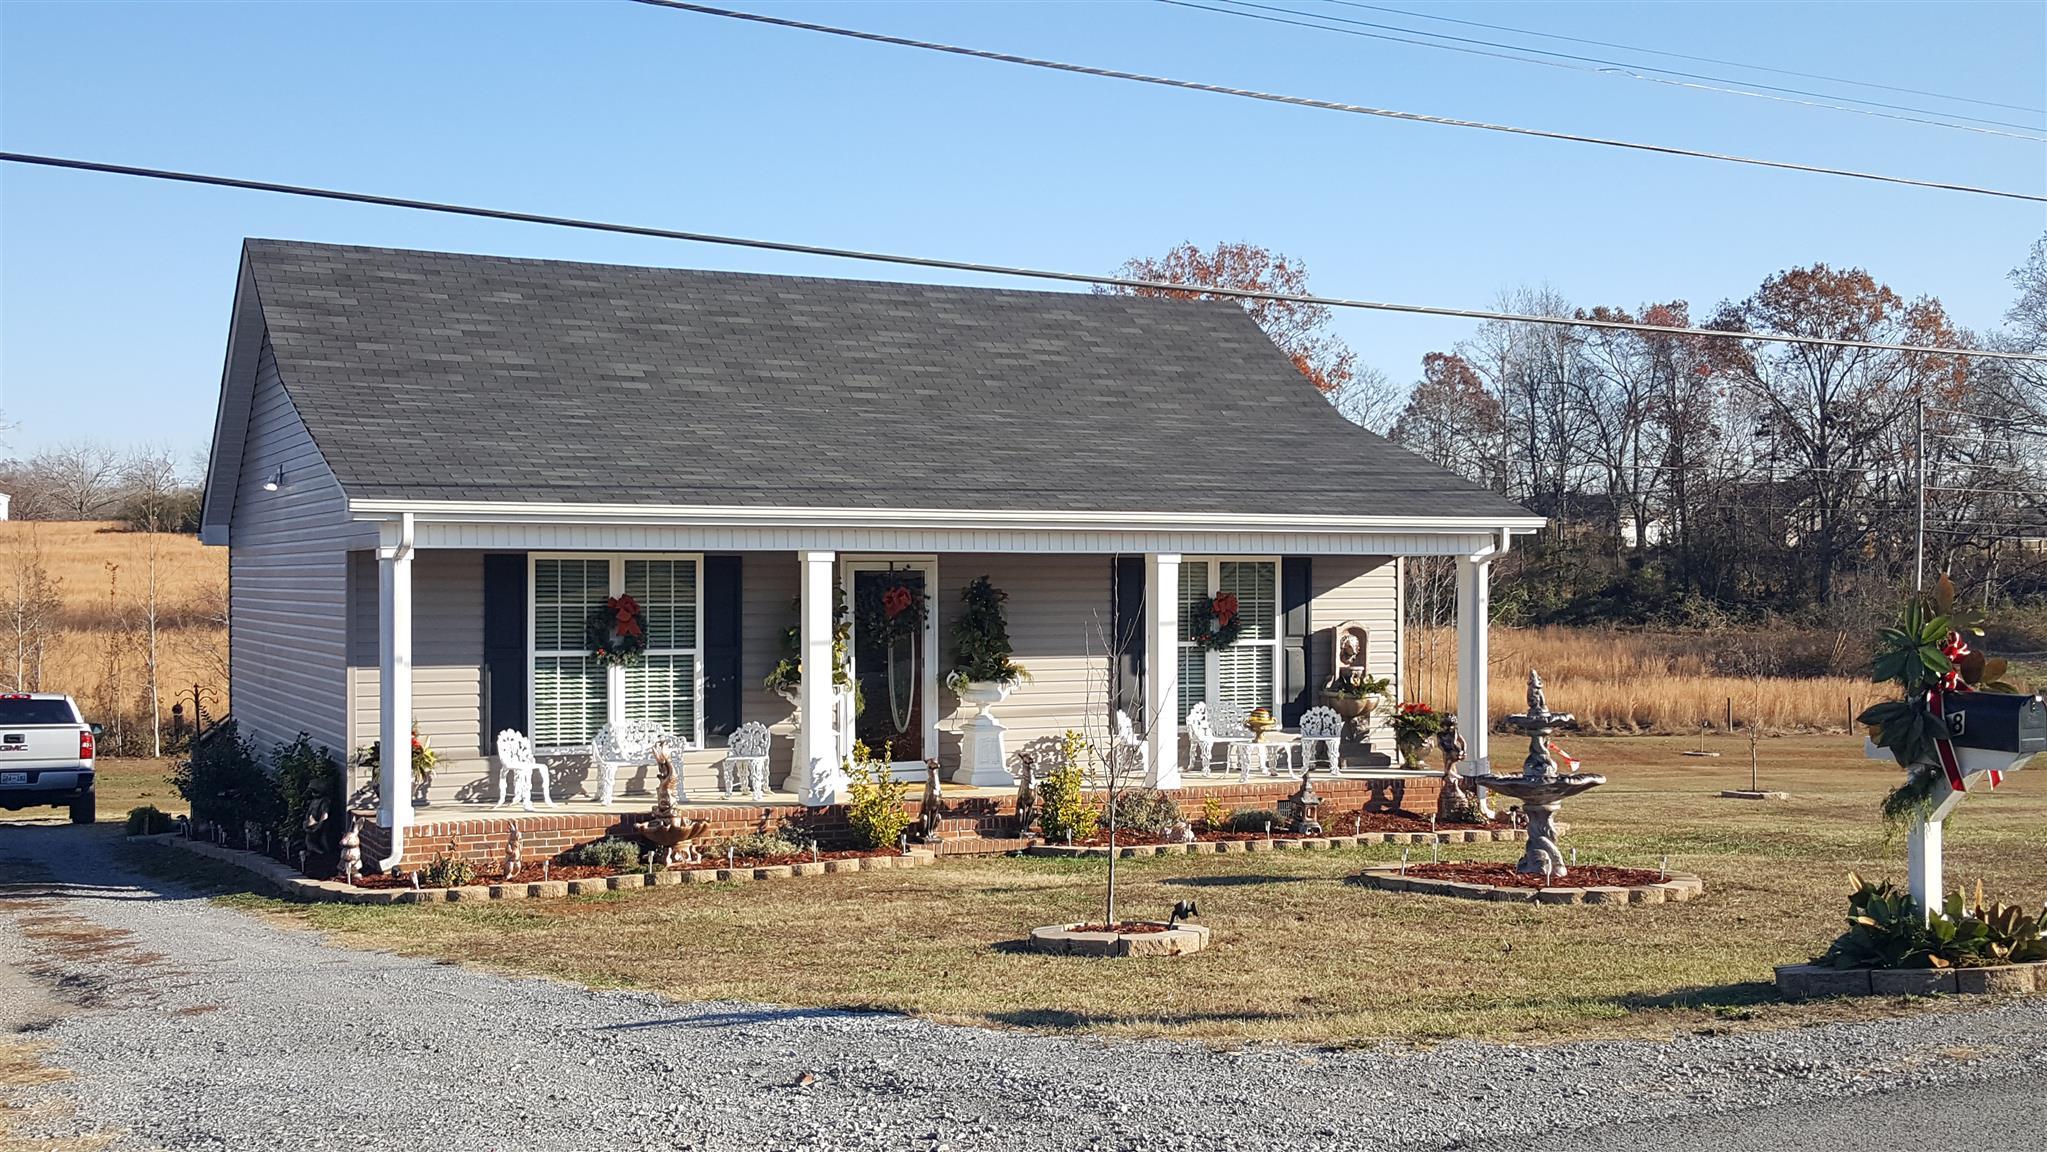 Photo of 38 Saddleford Dr  Fayetteville  TN